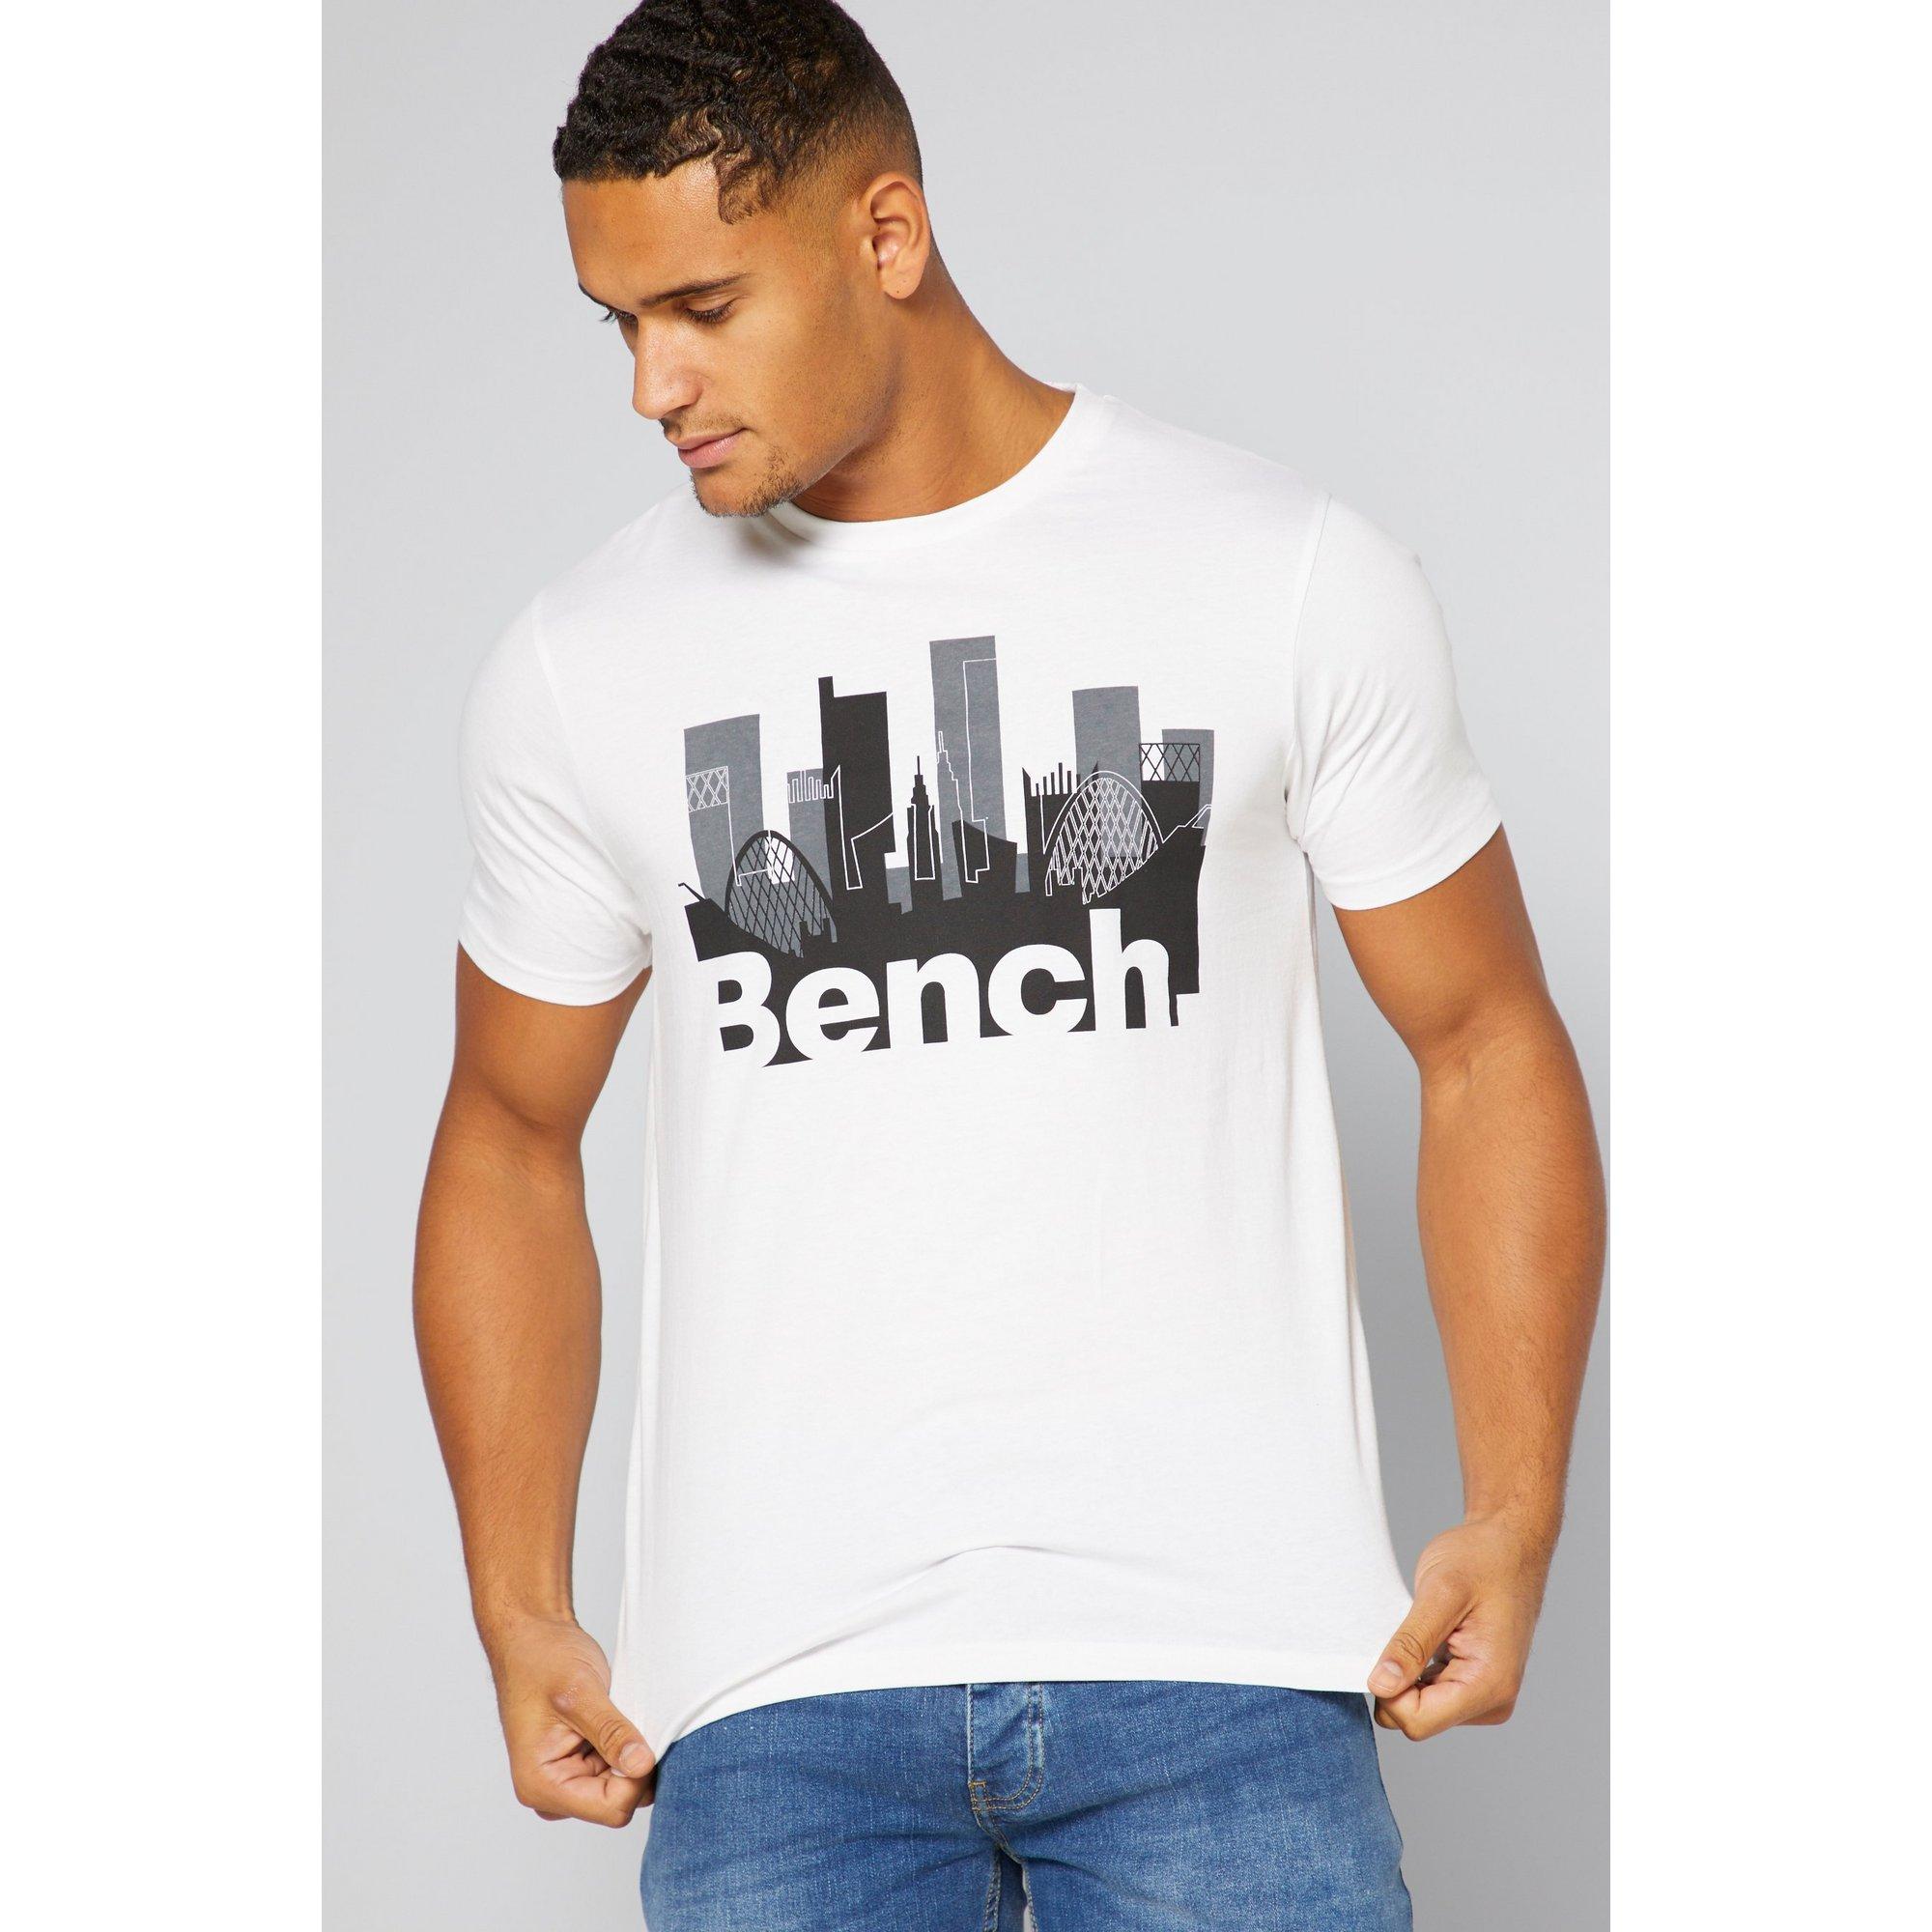 Image of Bench City Print White T-Shirt